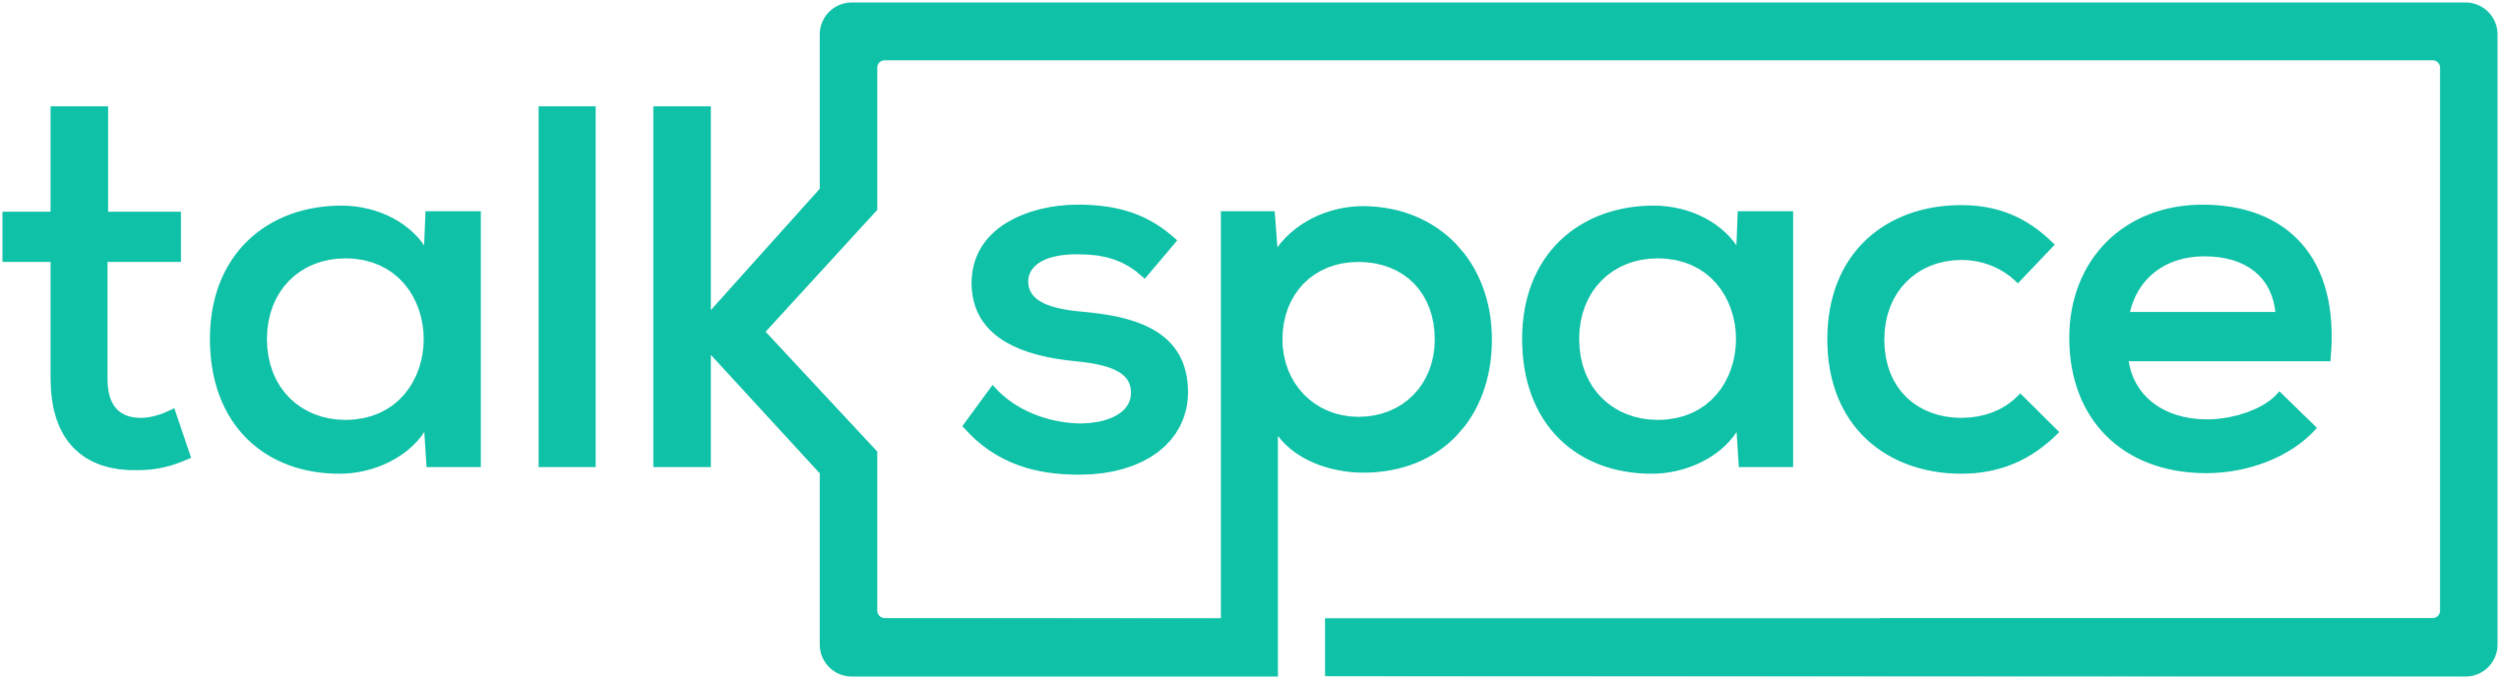 TS_nav_logo.png